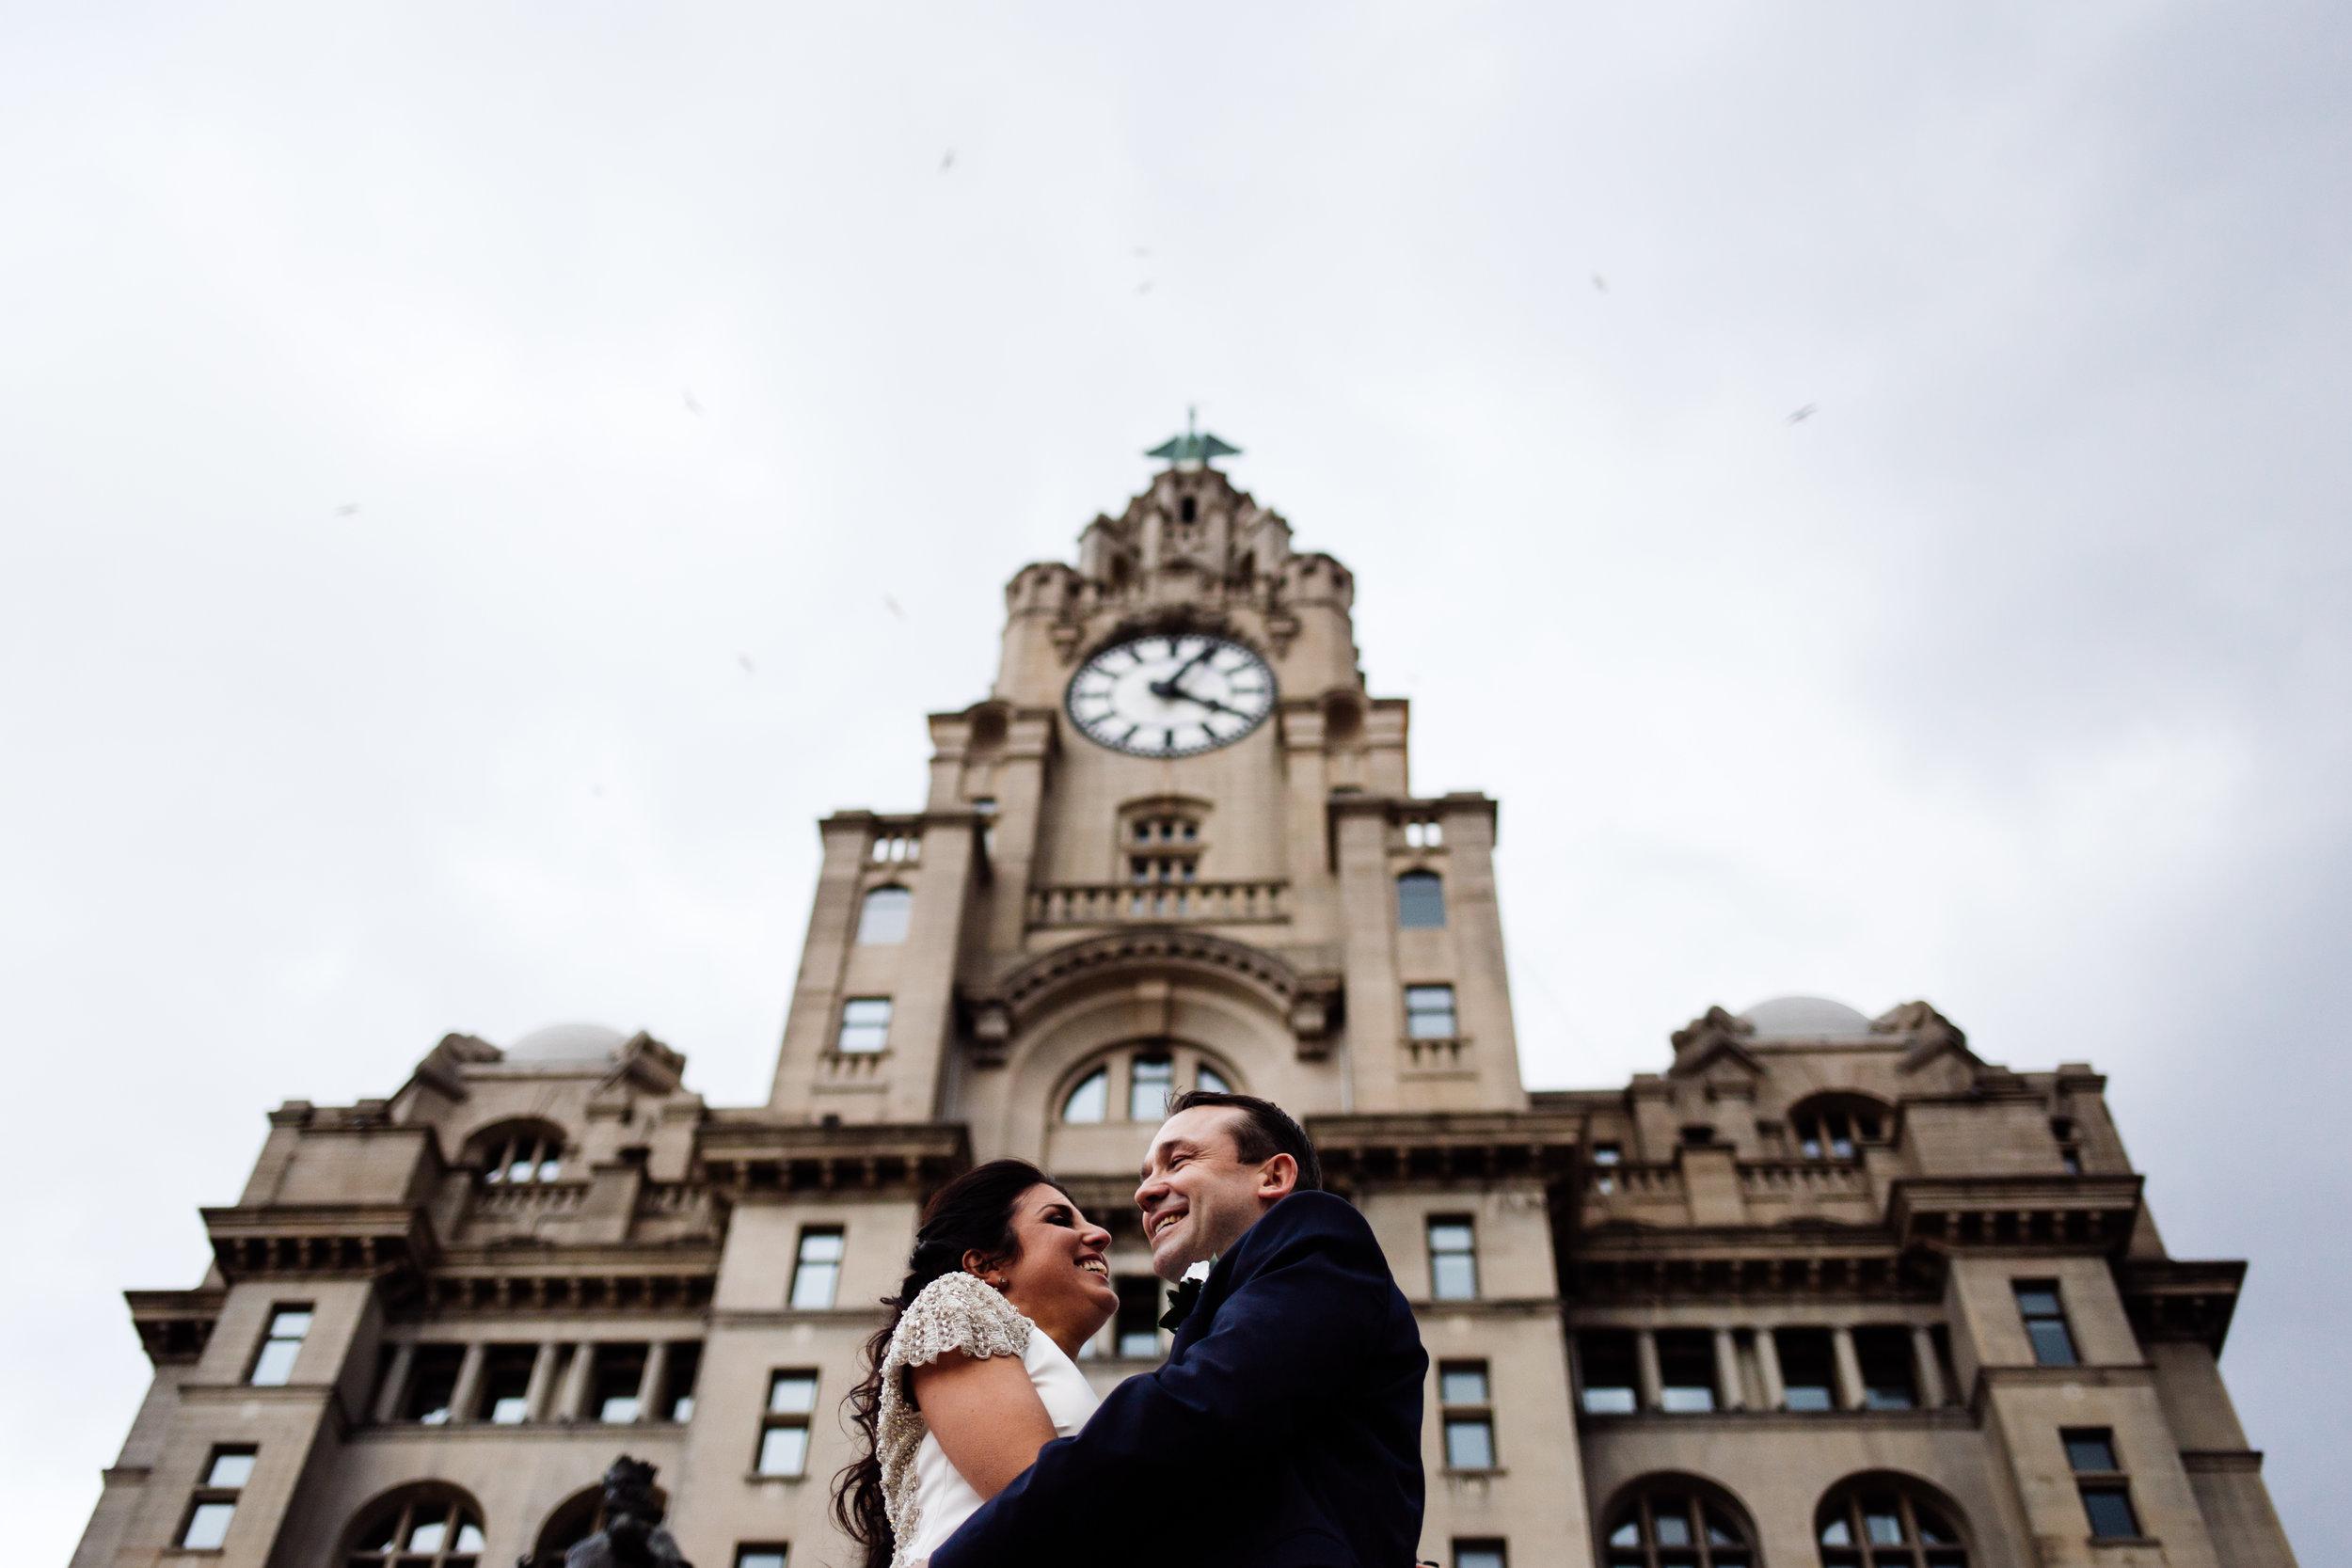 CAROLINE & CARL - The Venue, Royal Liver Building, Liverpool